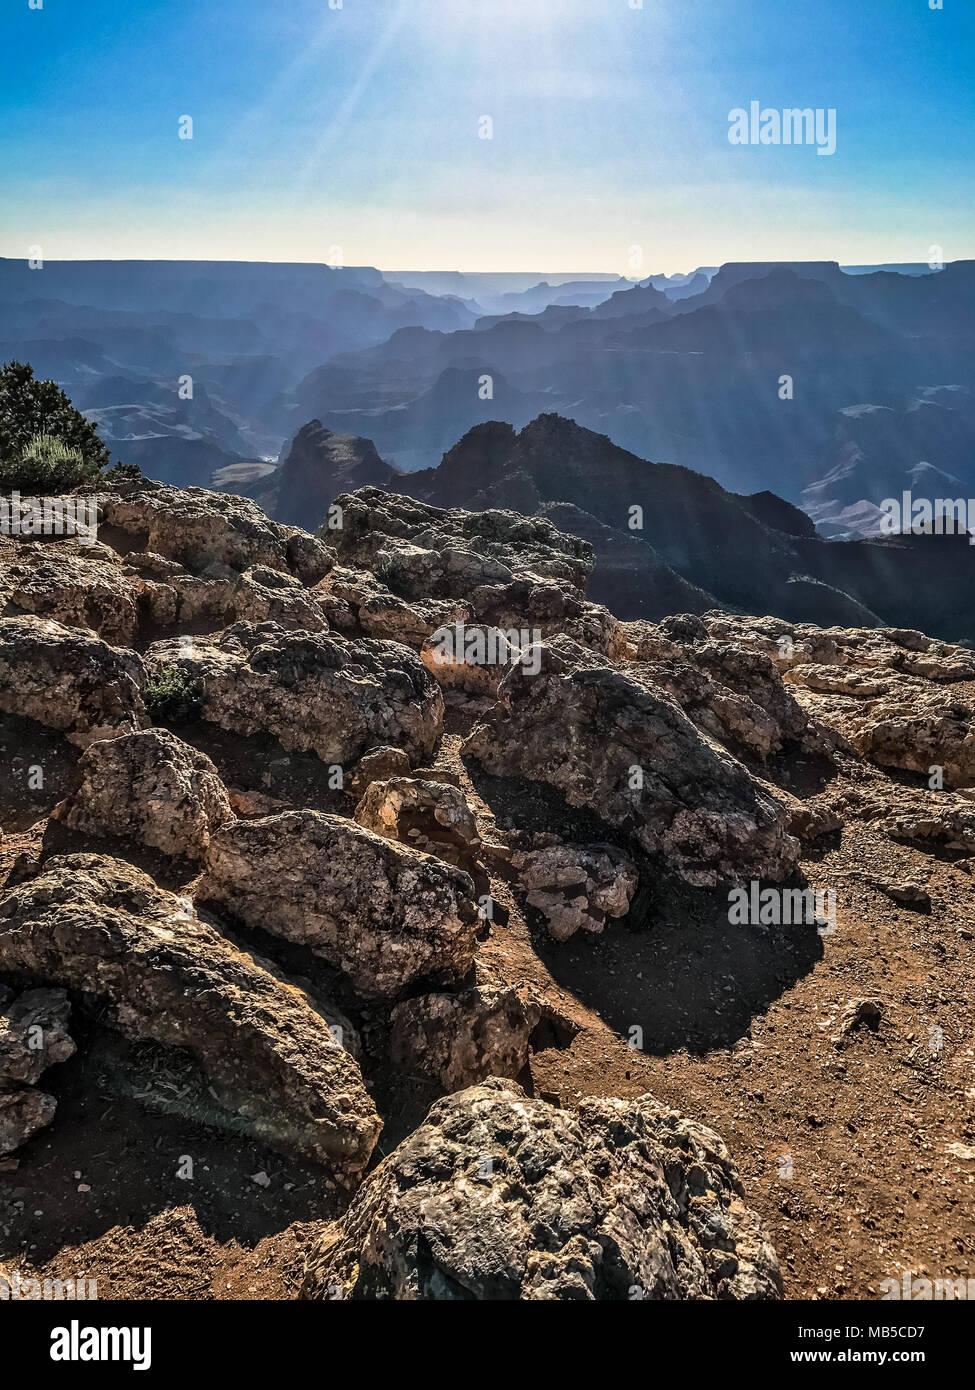 Rocky Terrain Grand Canyon National Park - Stock Image